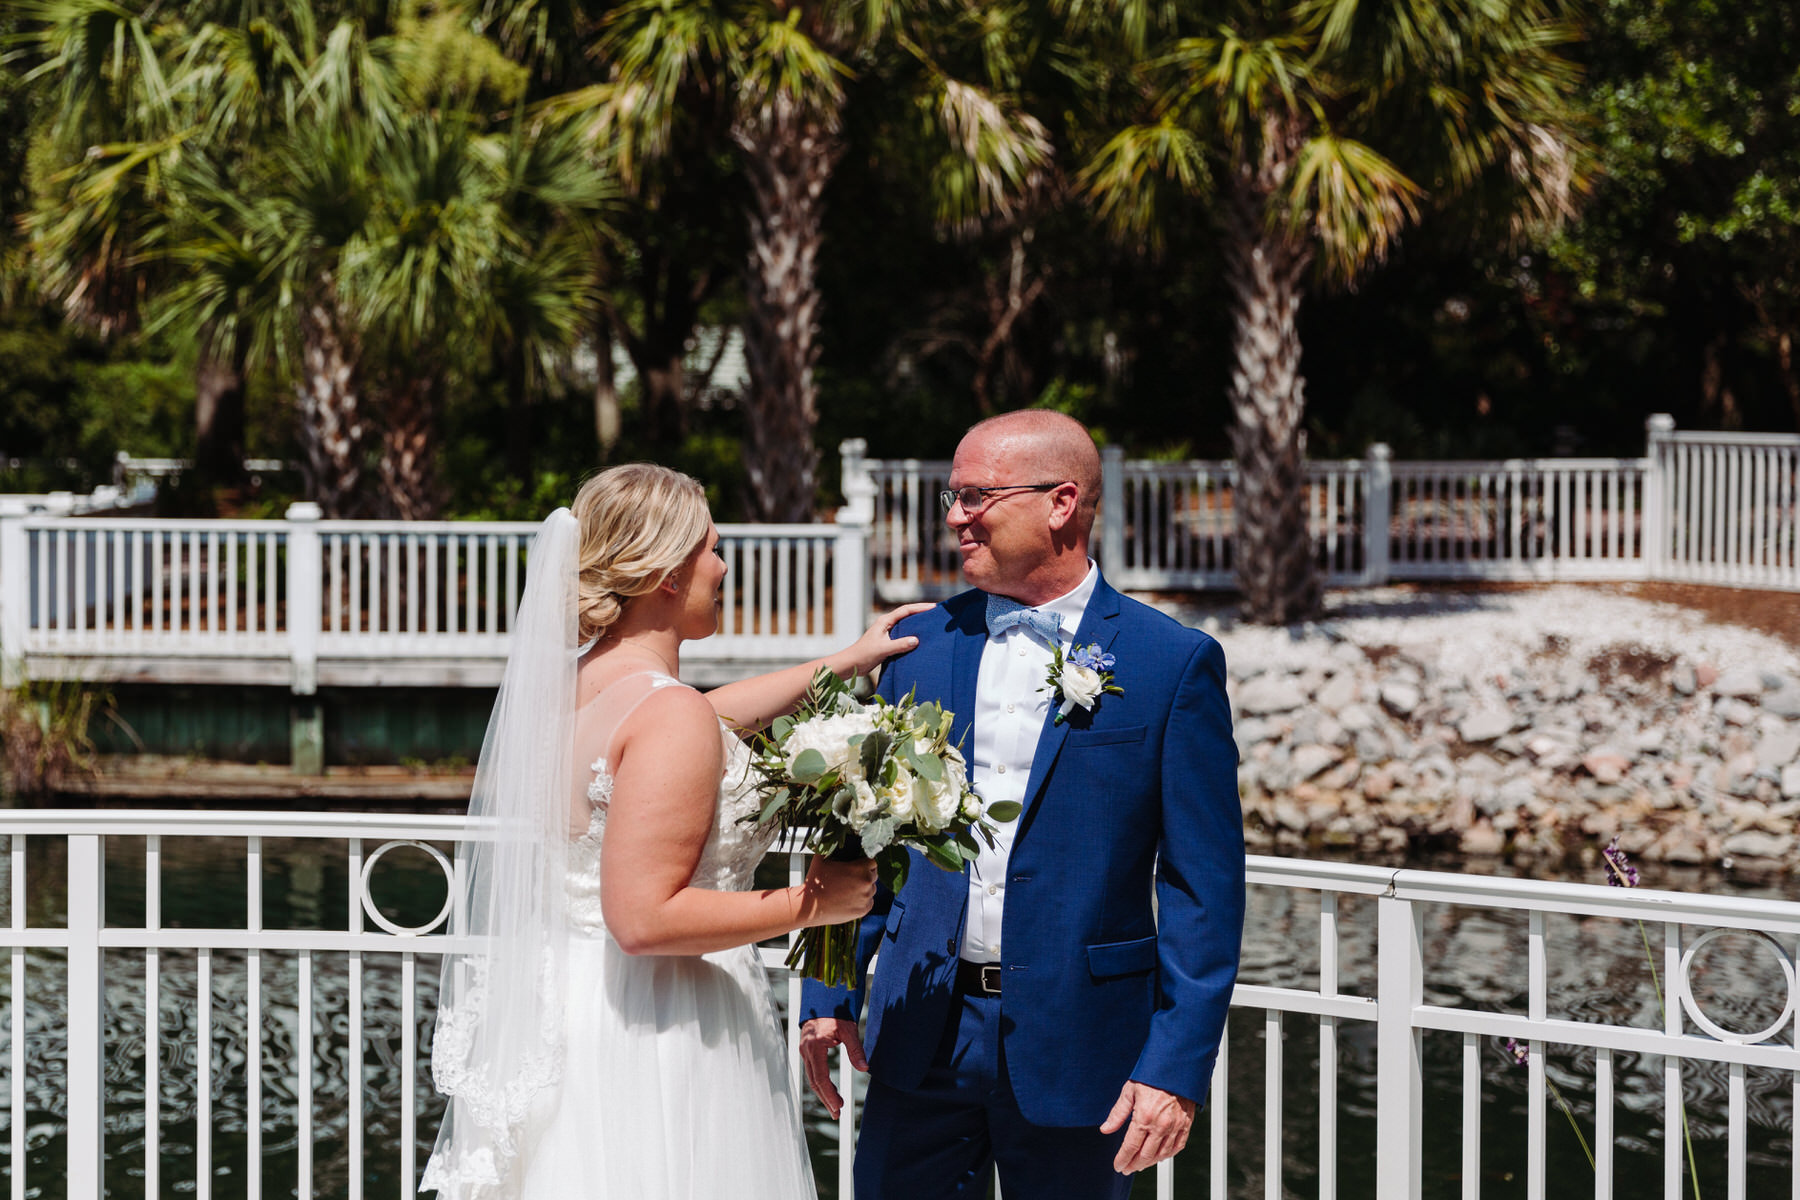 wild-dunes-charleston-isle-of-palms-IOP-wedding-759.JPG